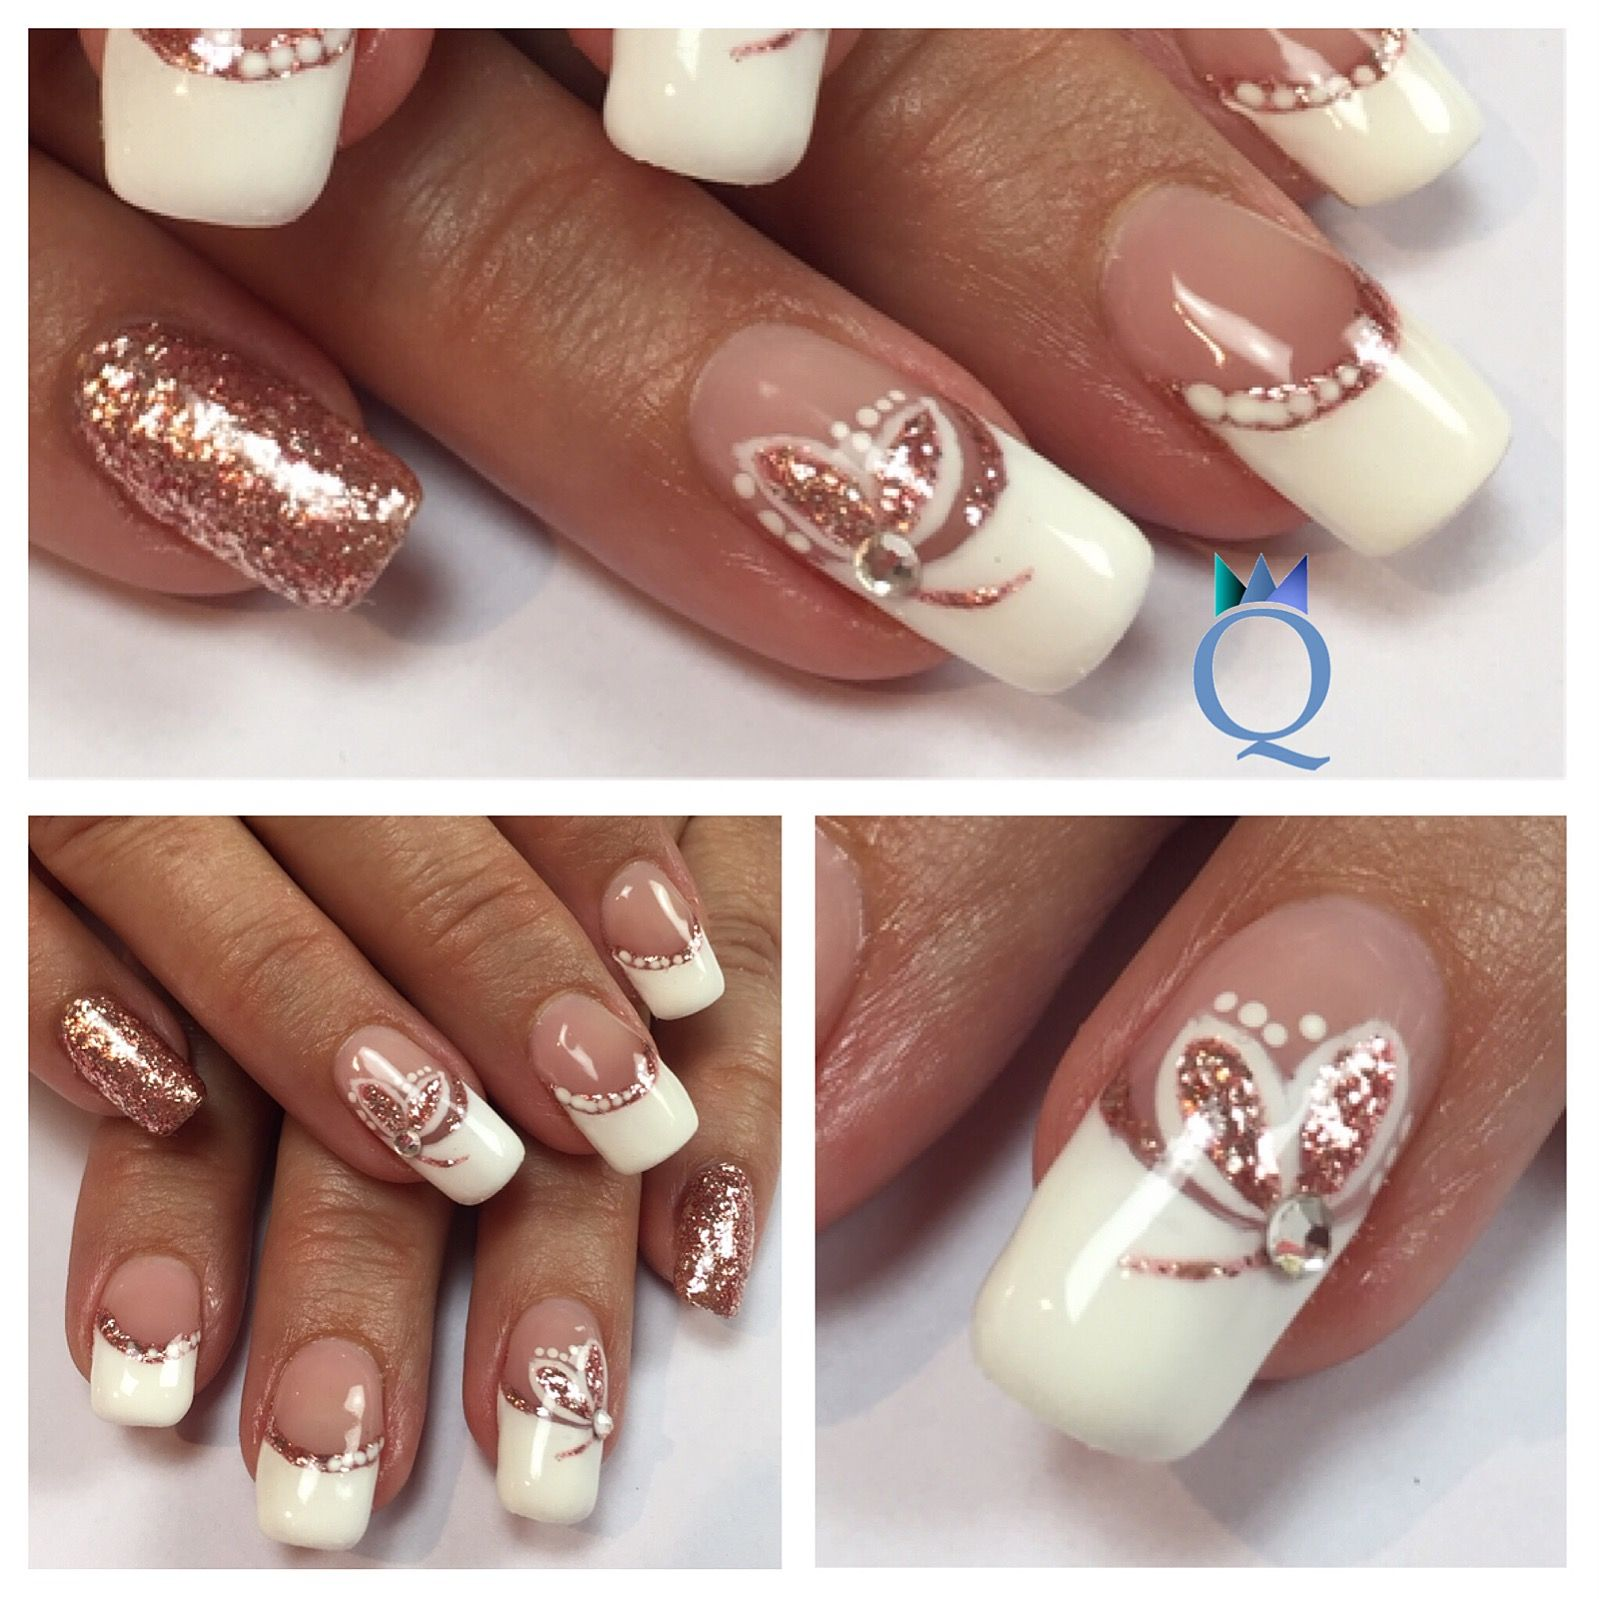 gelnails #nails #frenchnails #rosegold #handpainted #gelnägel #nägel ...